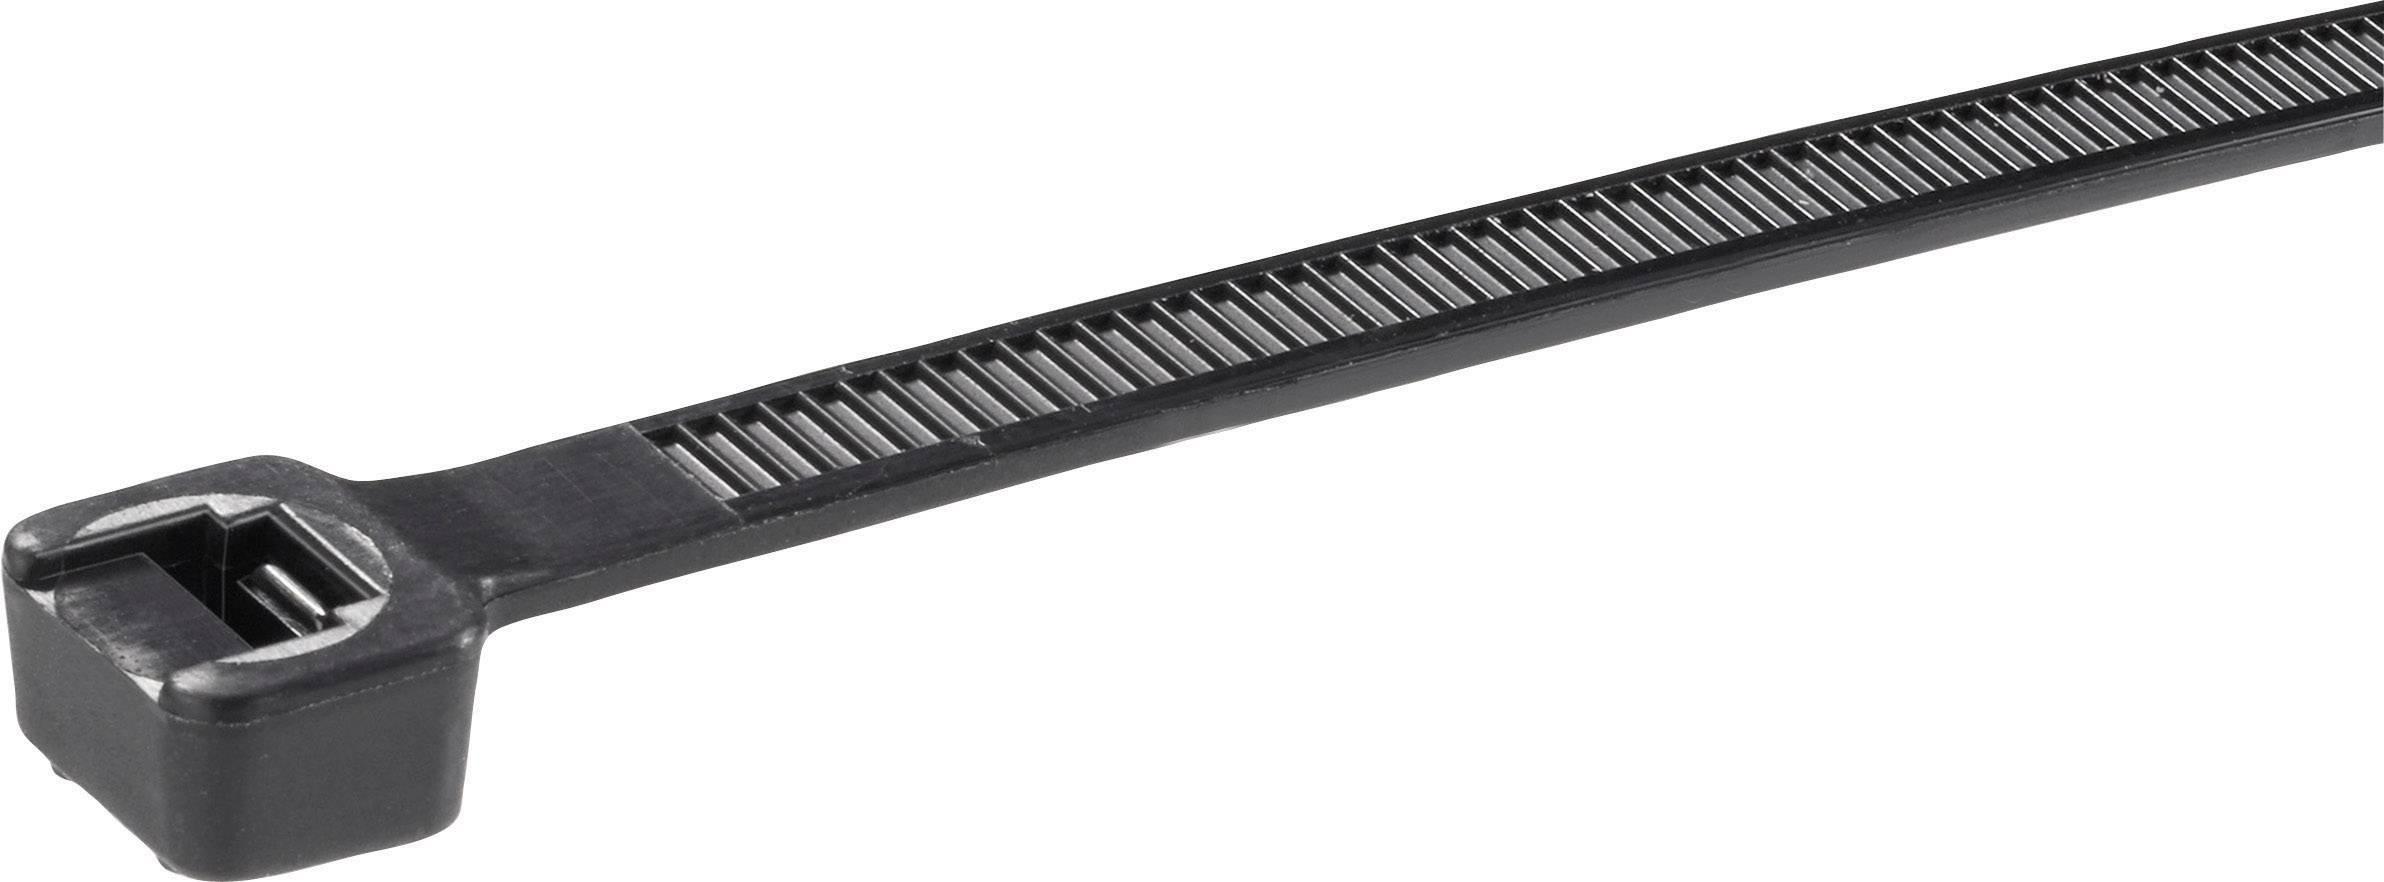 Sťahovacie pásky Panduit PLT2S-C7, 188 mm, polyamid 6.6, fialová, 100 ks